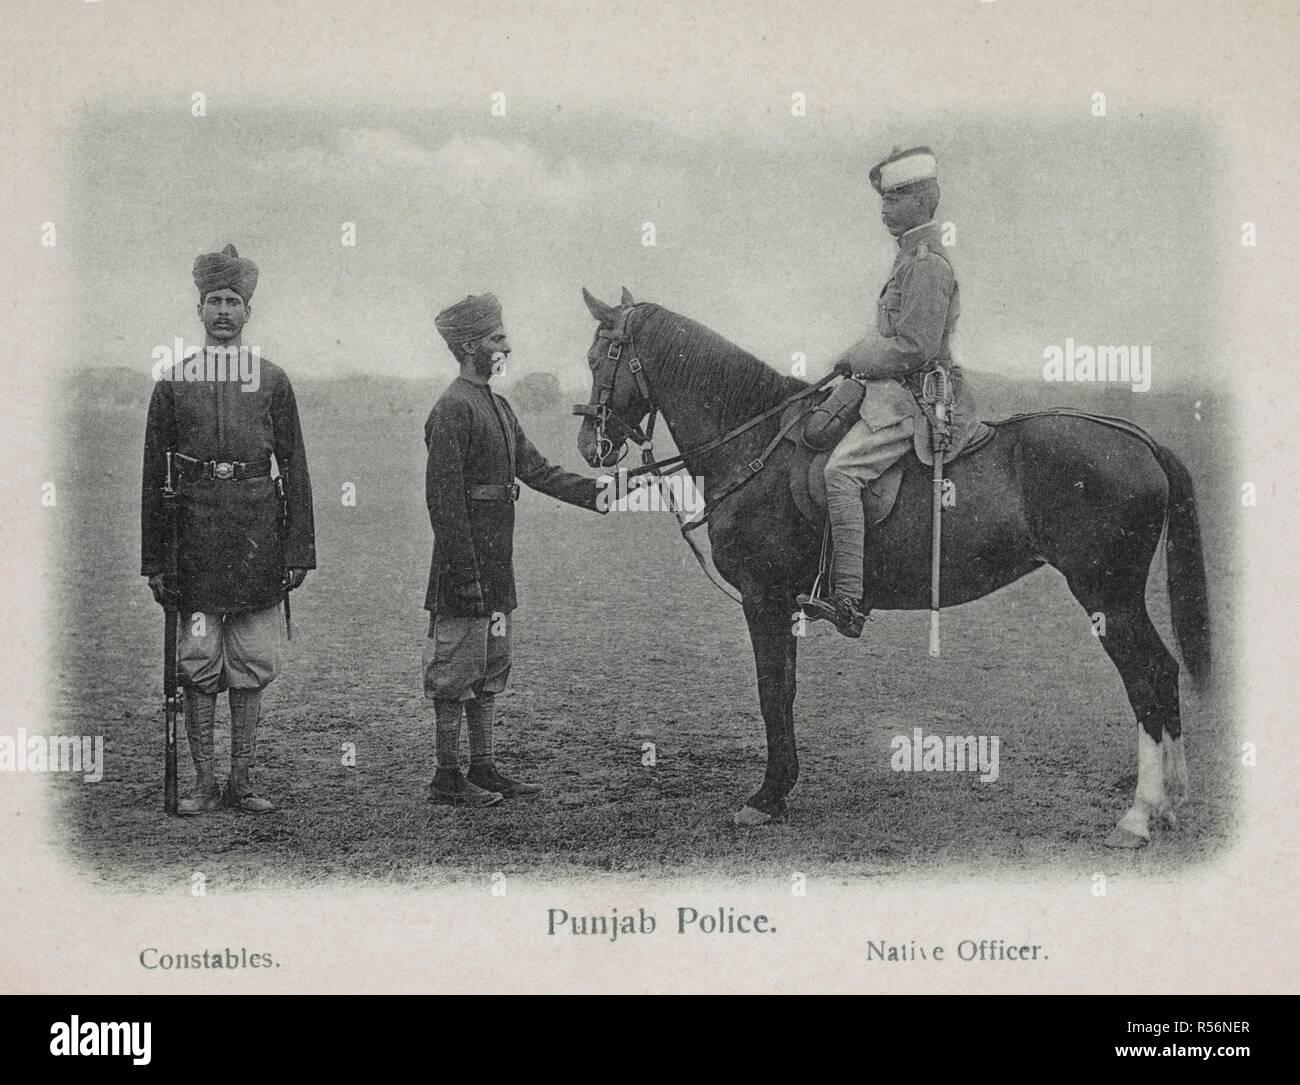 Carte De Linde En 1900.Police Du Pendjab Les Gendarmes Officier Natif Groupe En